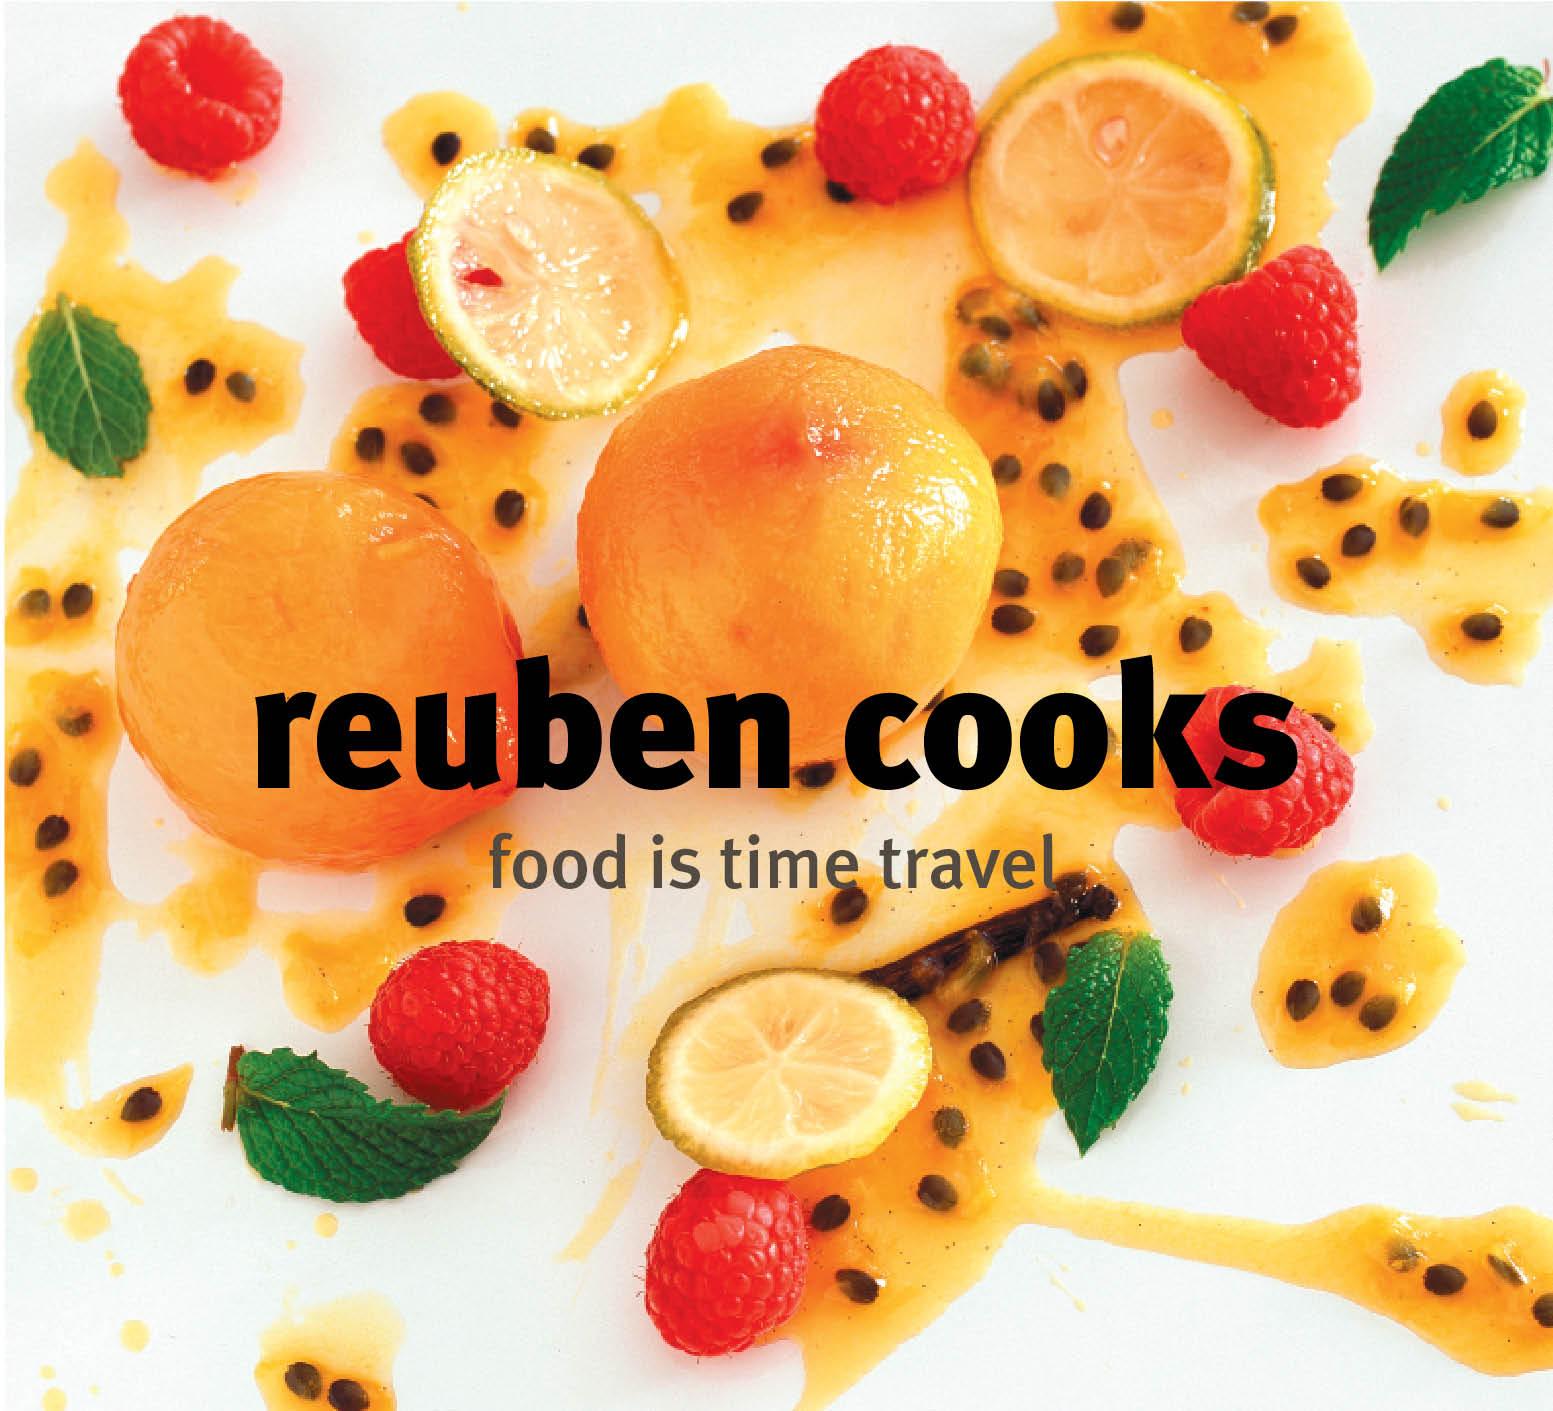 Reuben Cooks